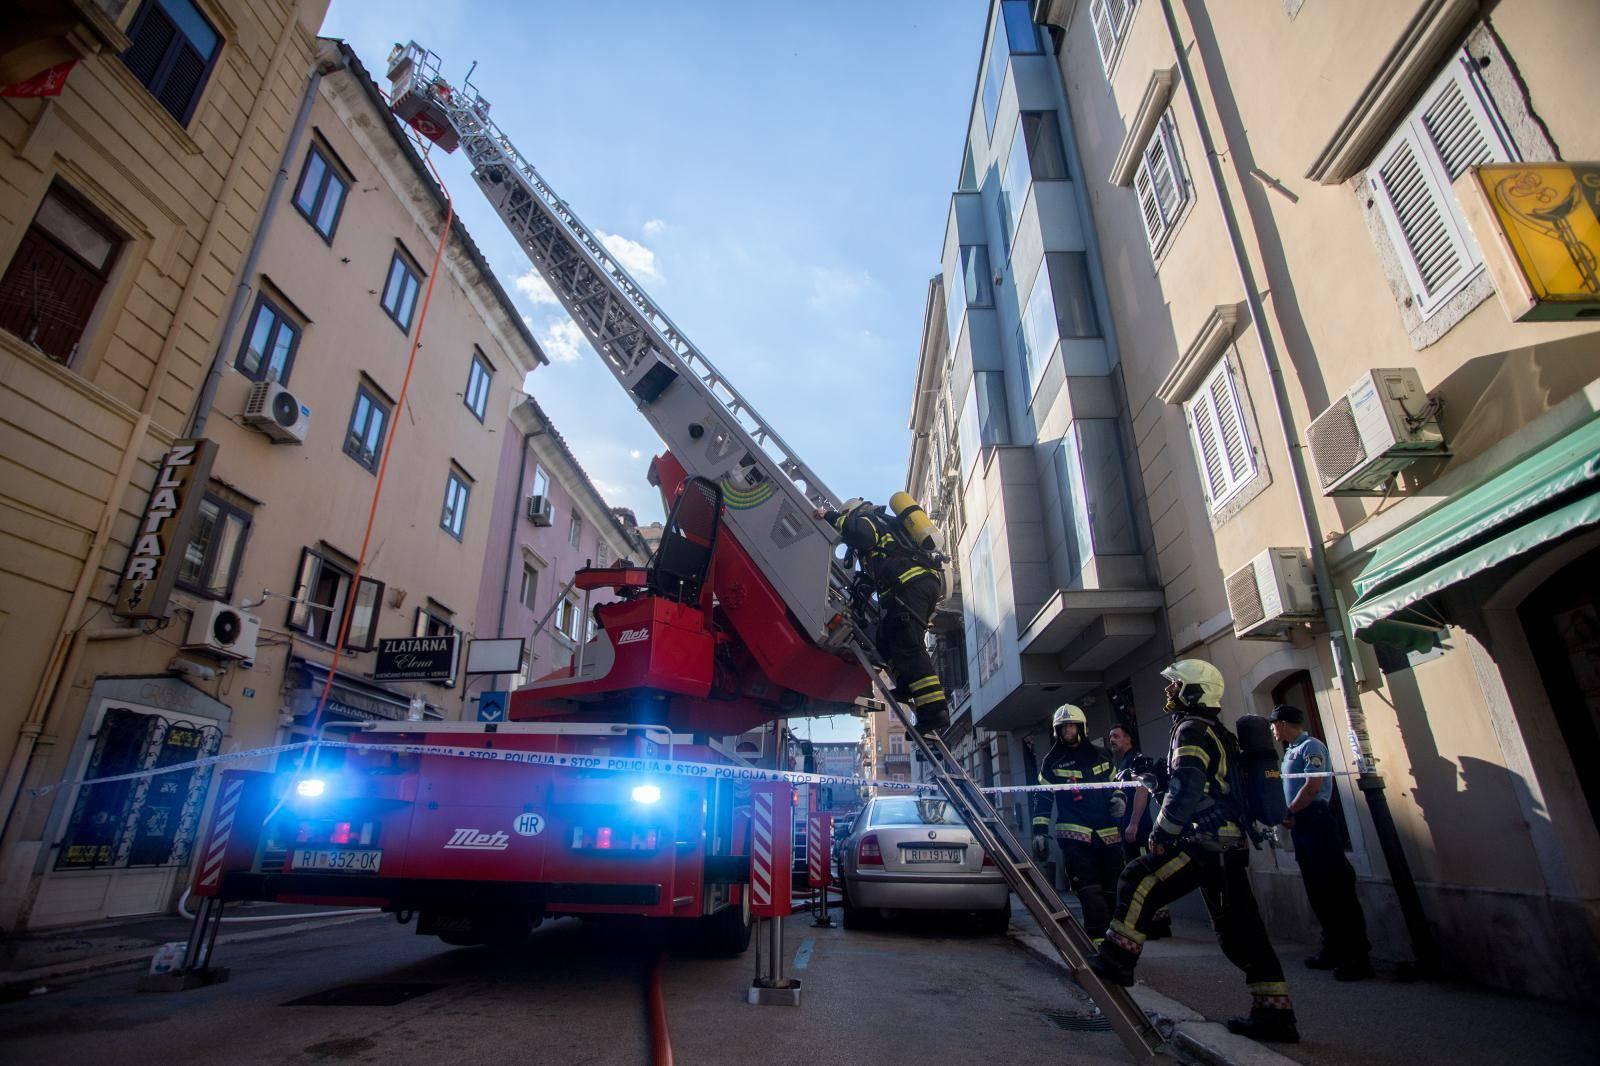 Rijeka: POžar na krovištu zgrade u centru grada